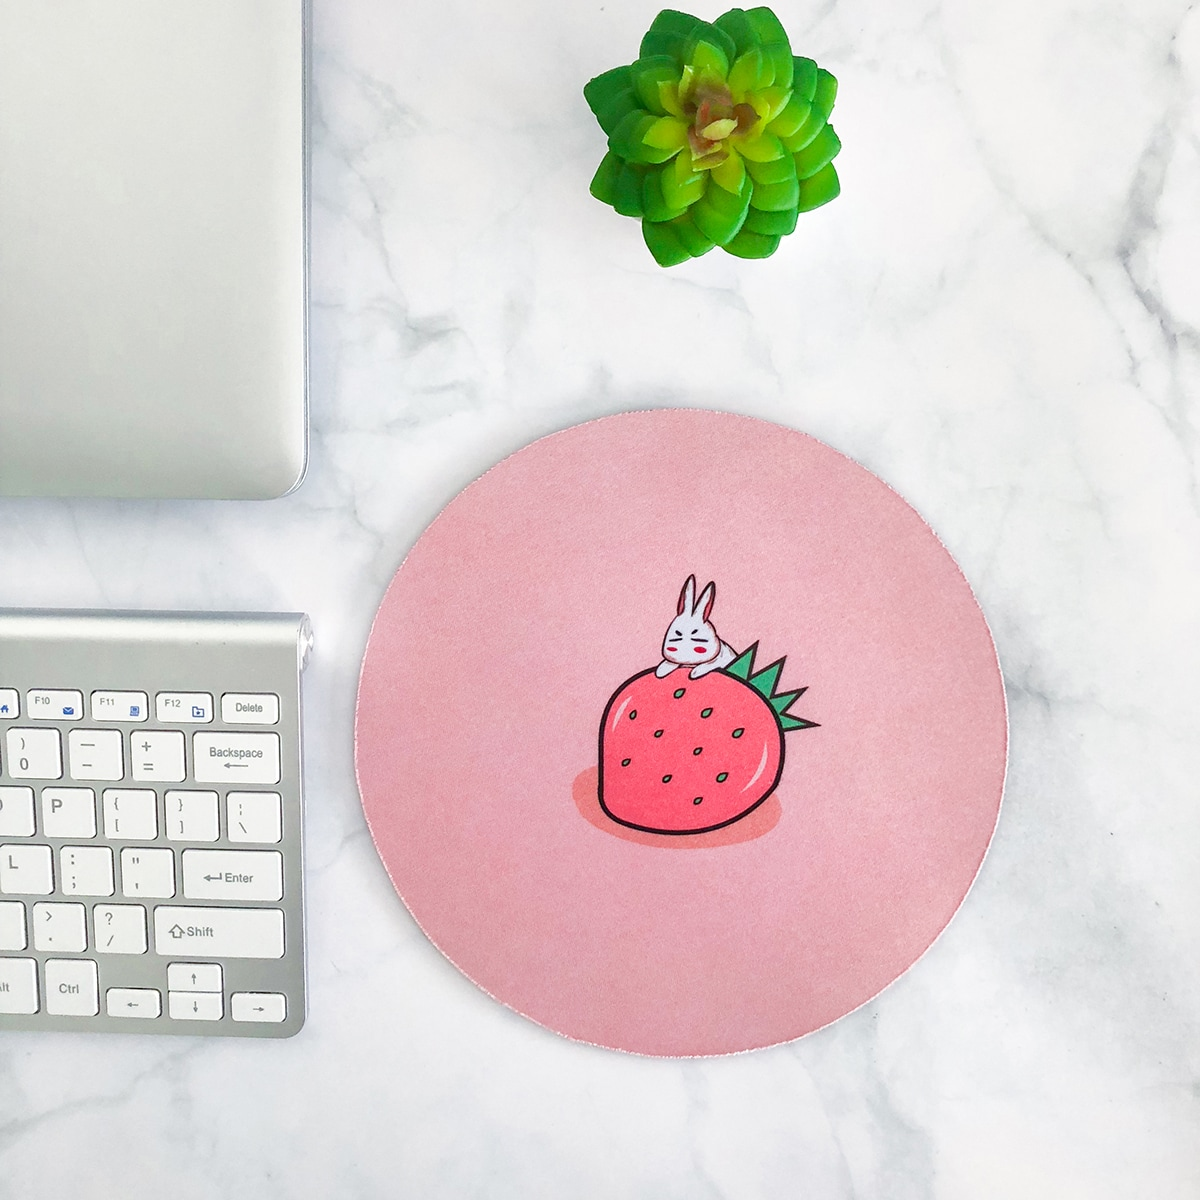 Mauspad mit Hase & Erdbeere Muster